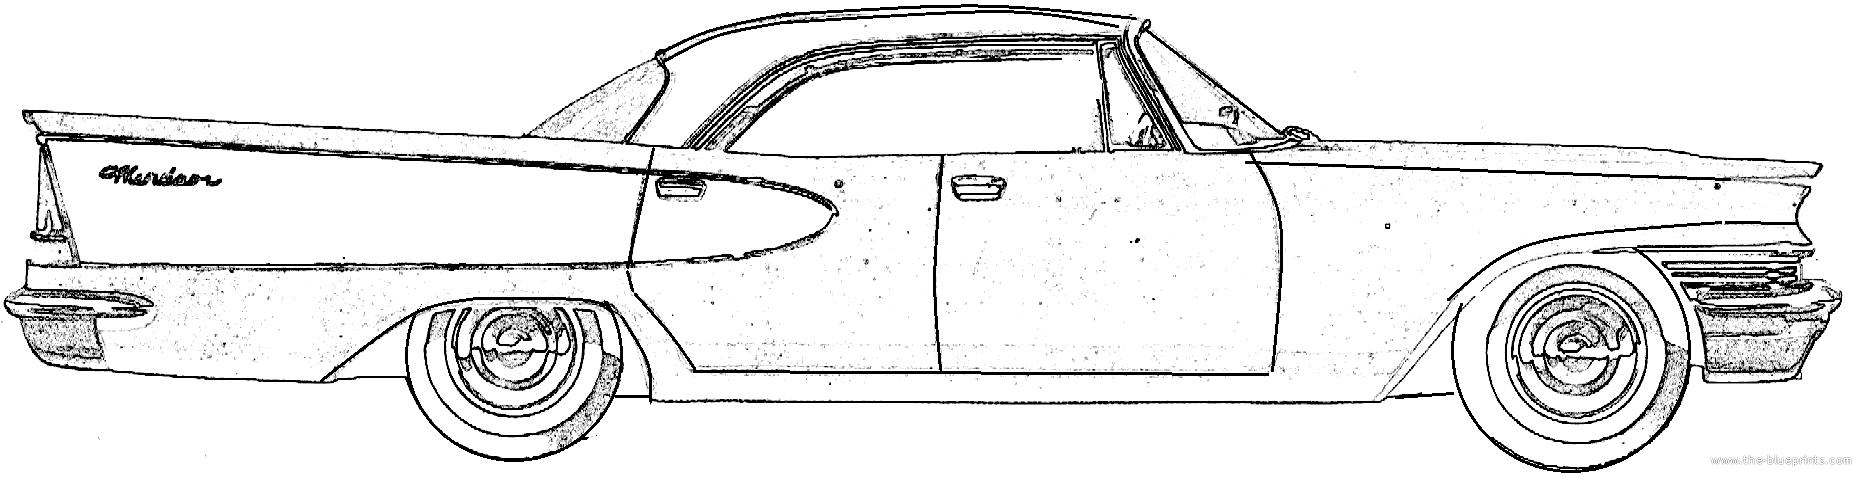 The blueprints cars chrysler for 1957 chrysler windsor 2 door hardtop